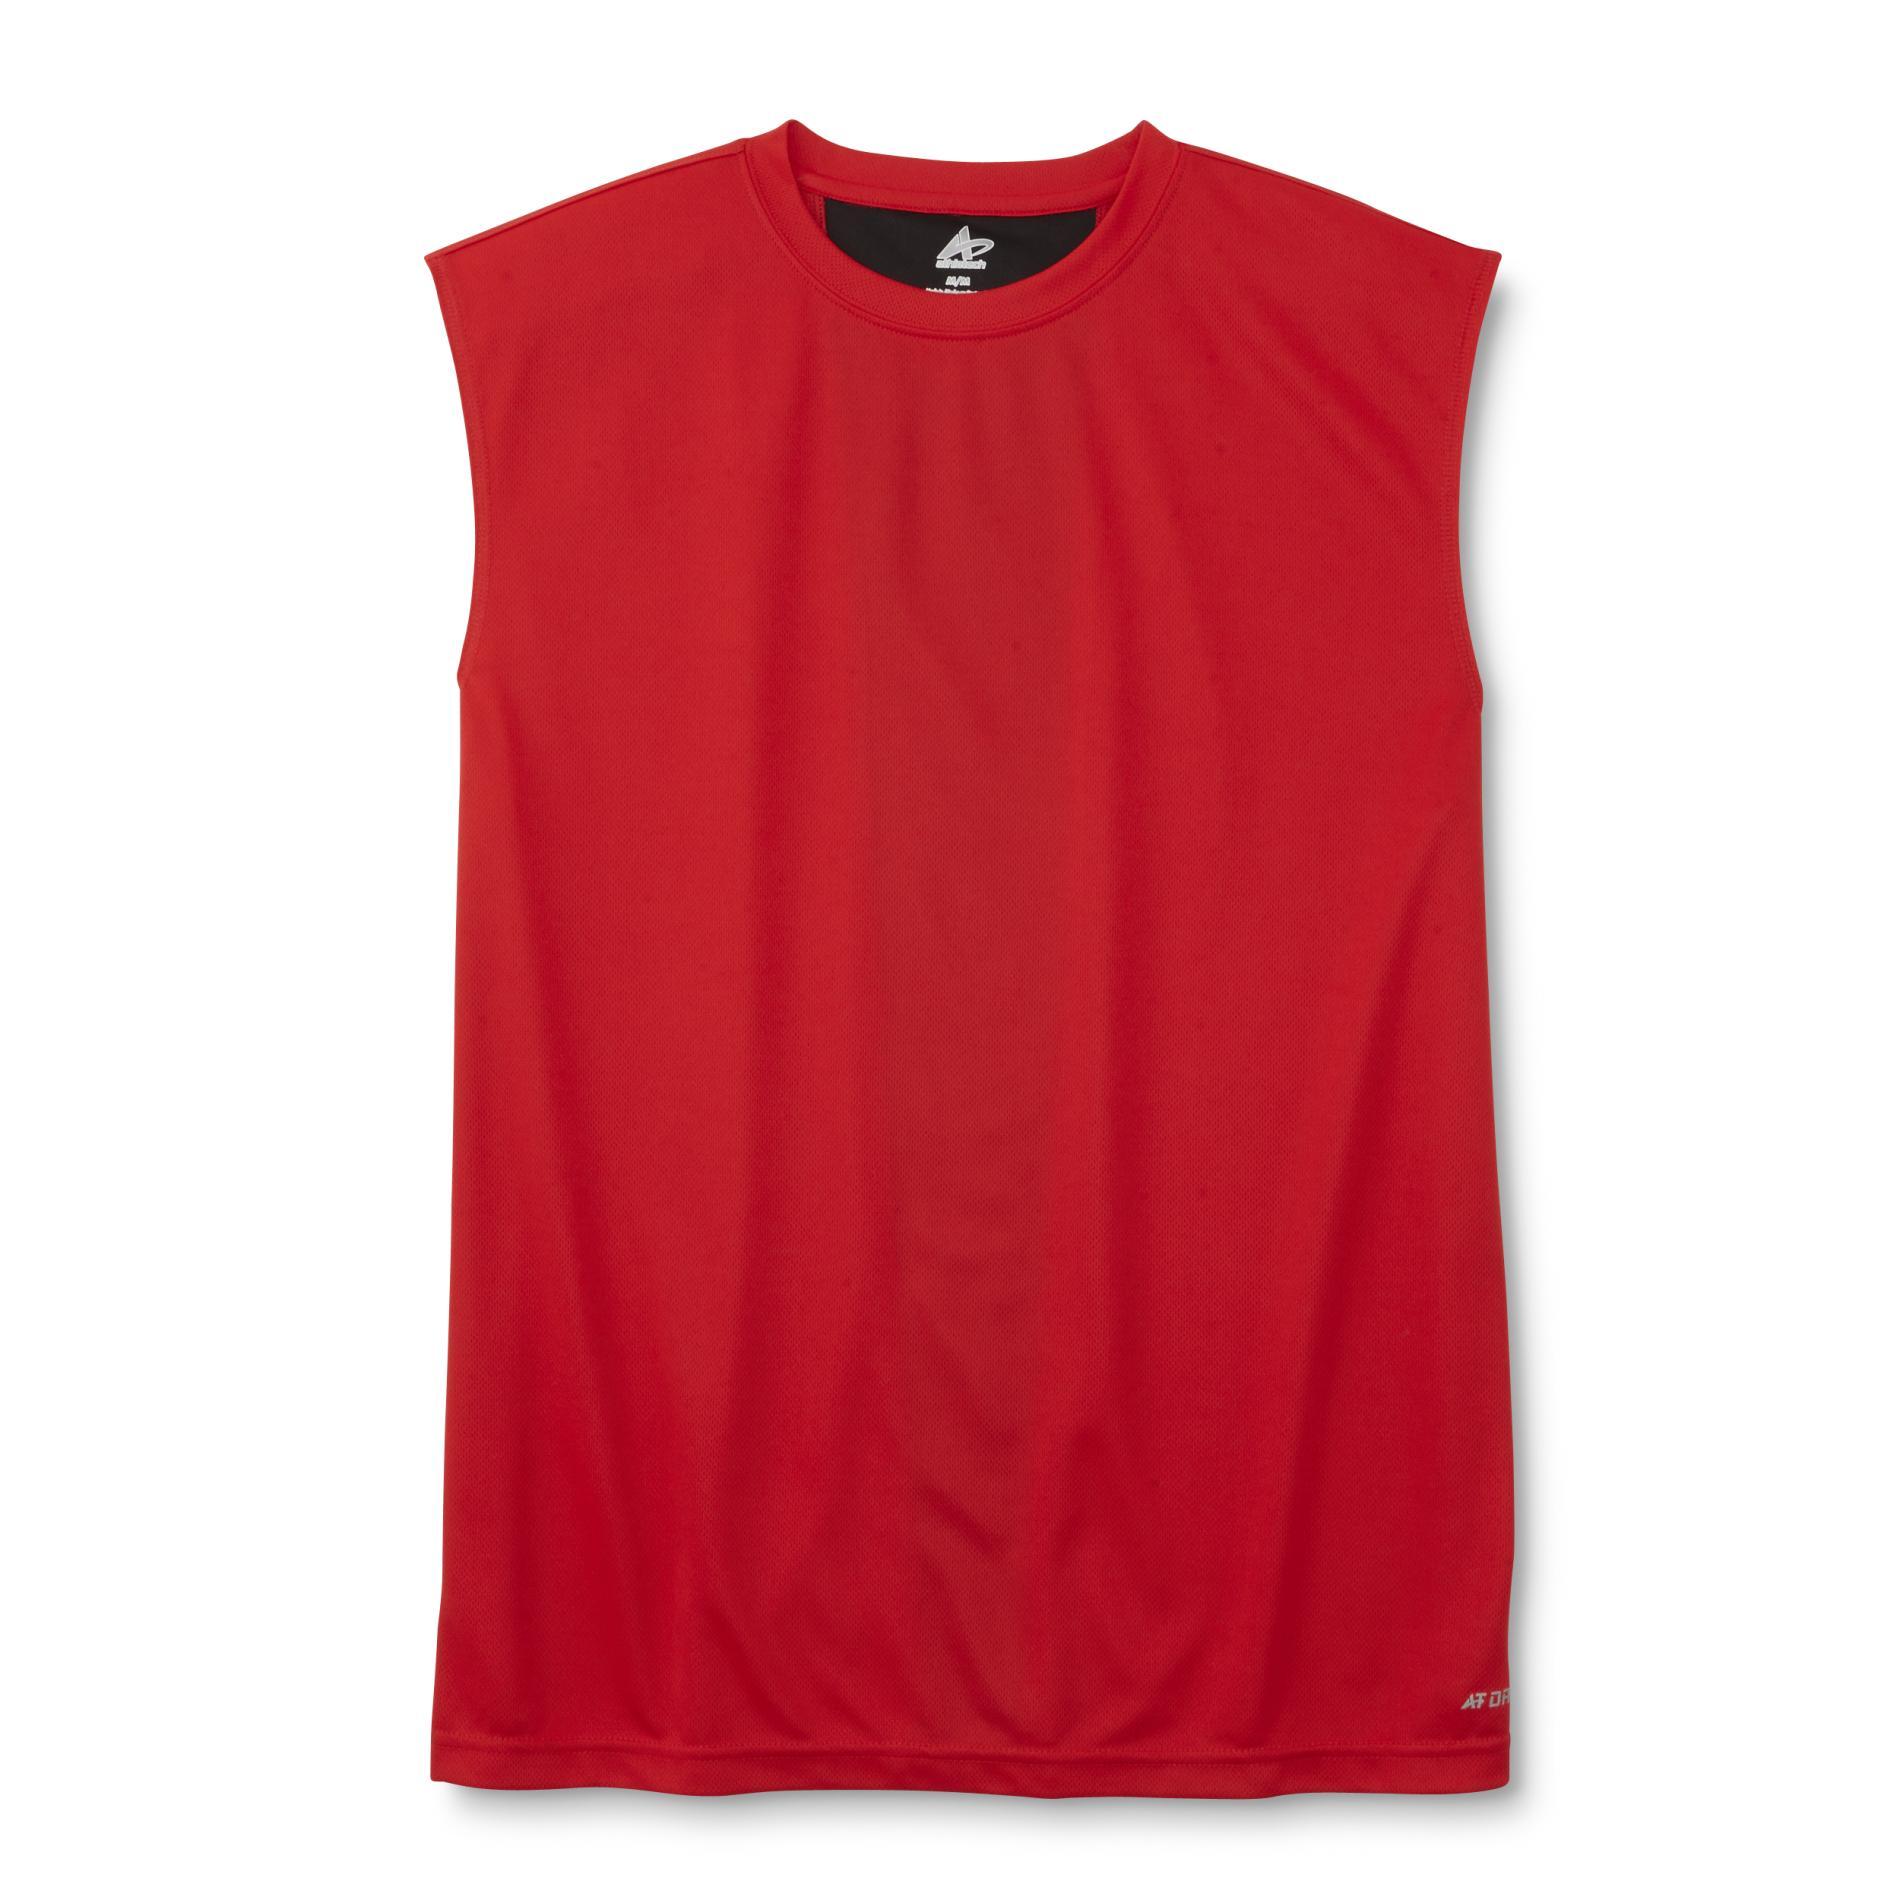 Men's Sleeveless Athletic Shirt